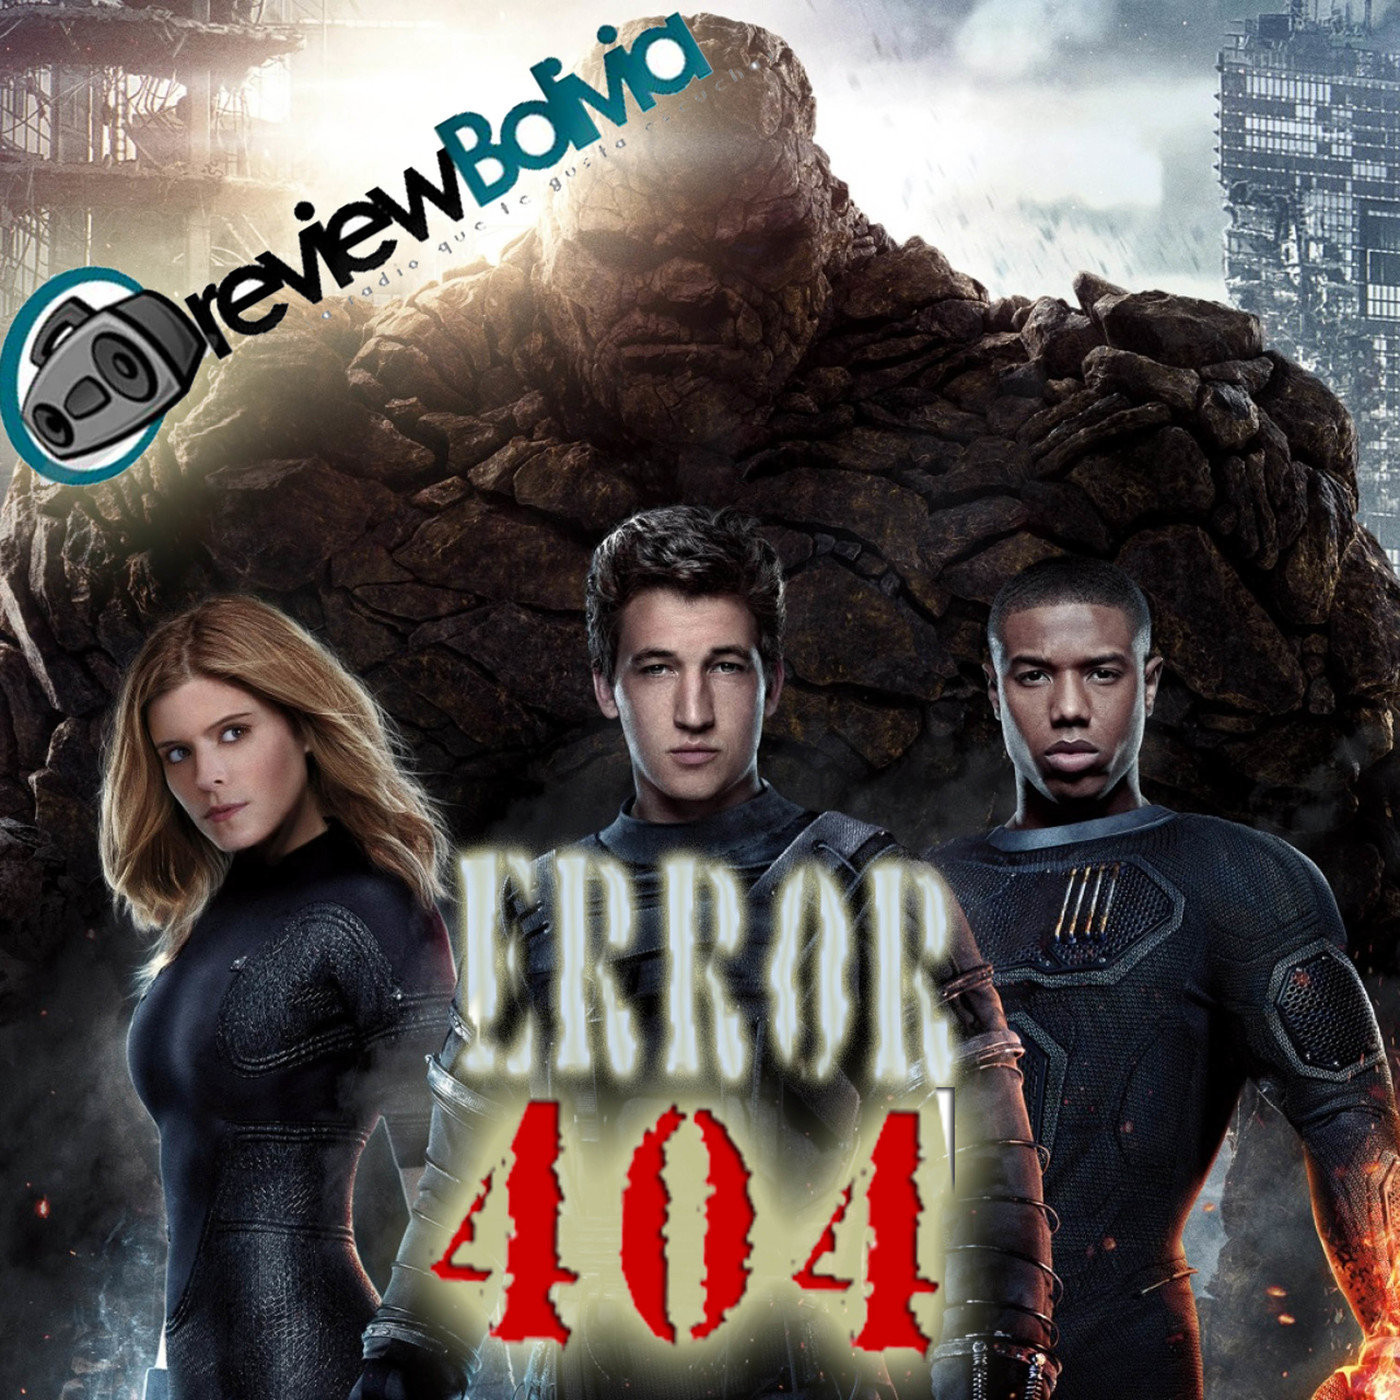 <![CDATA[Fantastic Four 2015 - Error 404]]>